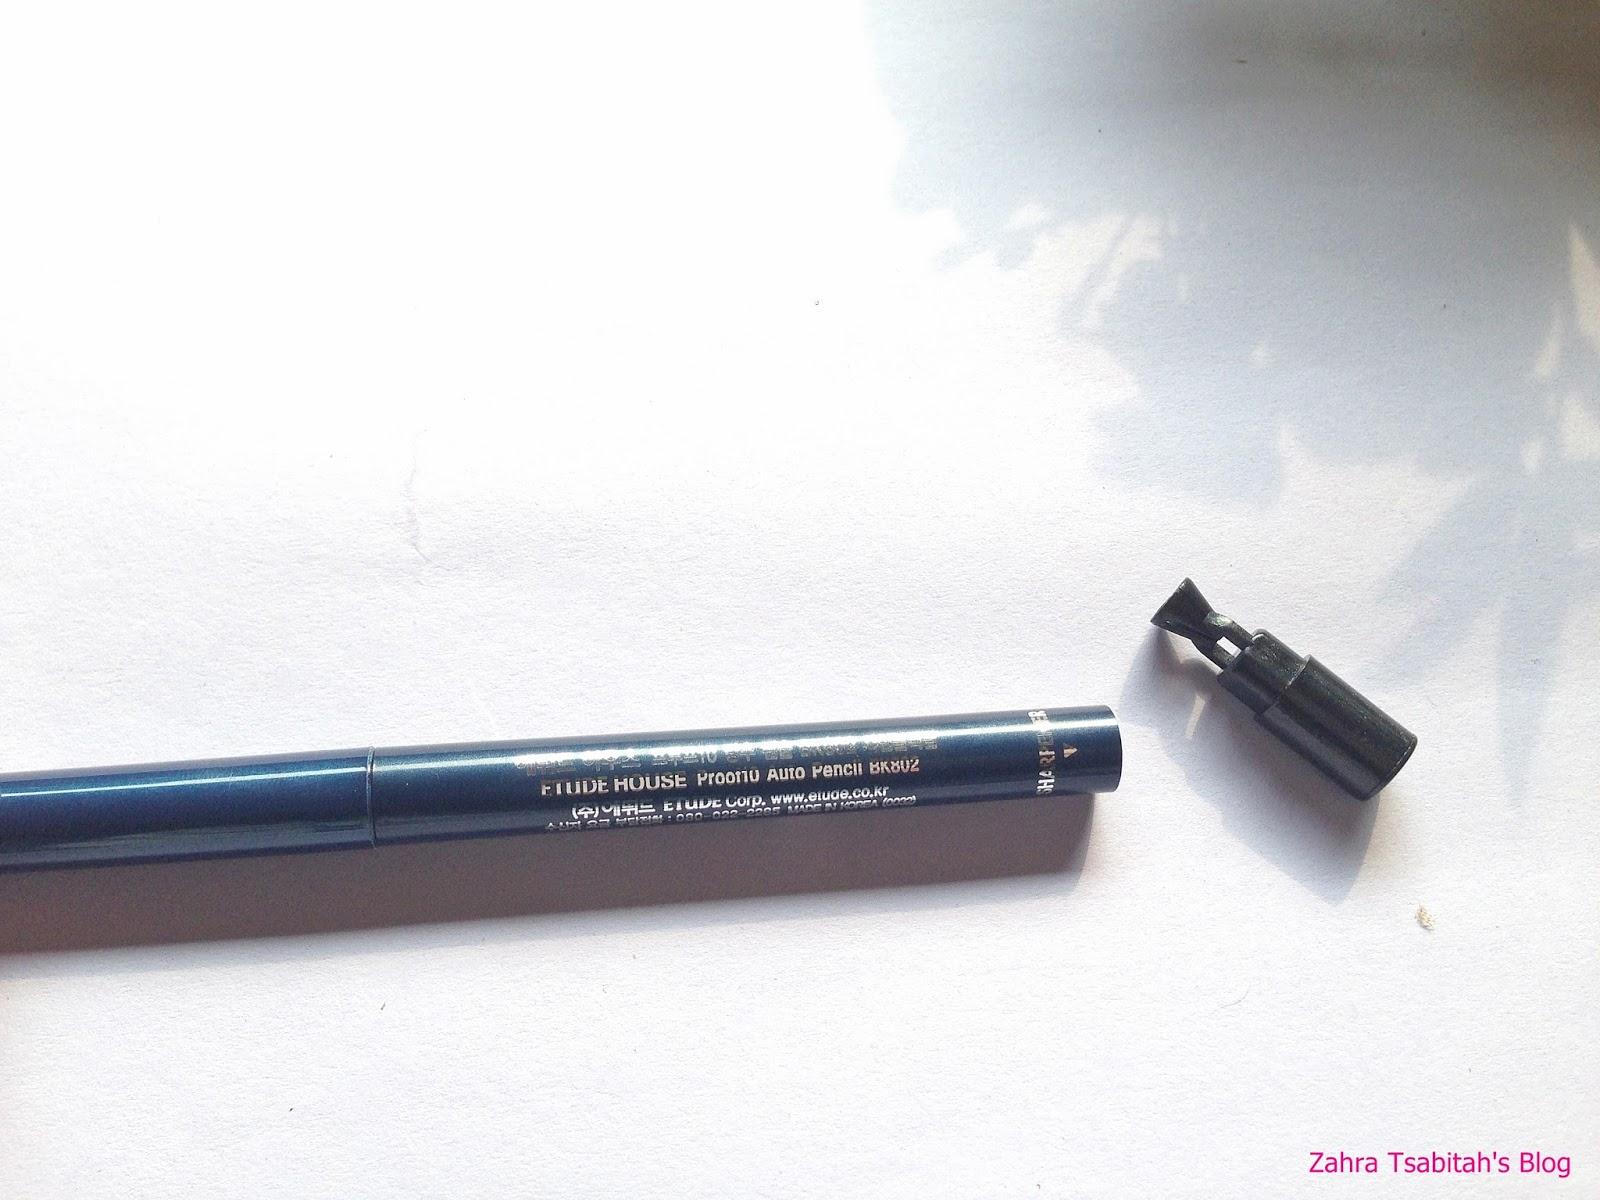 Zahra Tsabitahs Blog Review Etude House Proof10 Auto Pencil Eyeliner Warna Putar Jadi Kalau Mau Dan Keluarin Eyelinernya Harus Hati Banget Jangan Bar Biar Nggak Patah Ya